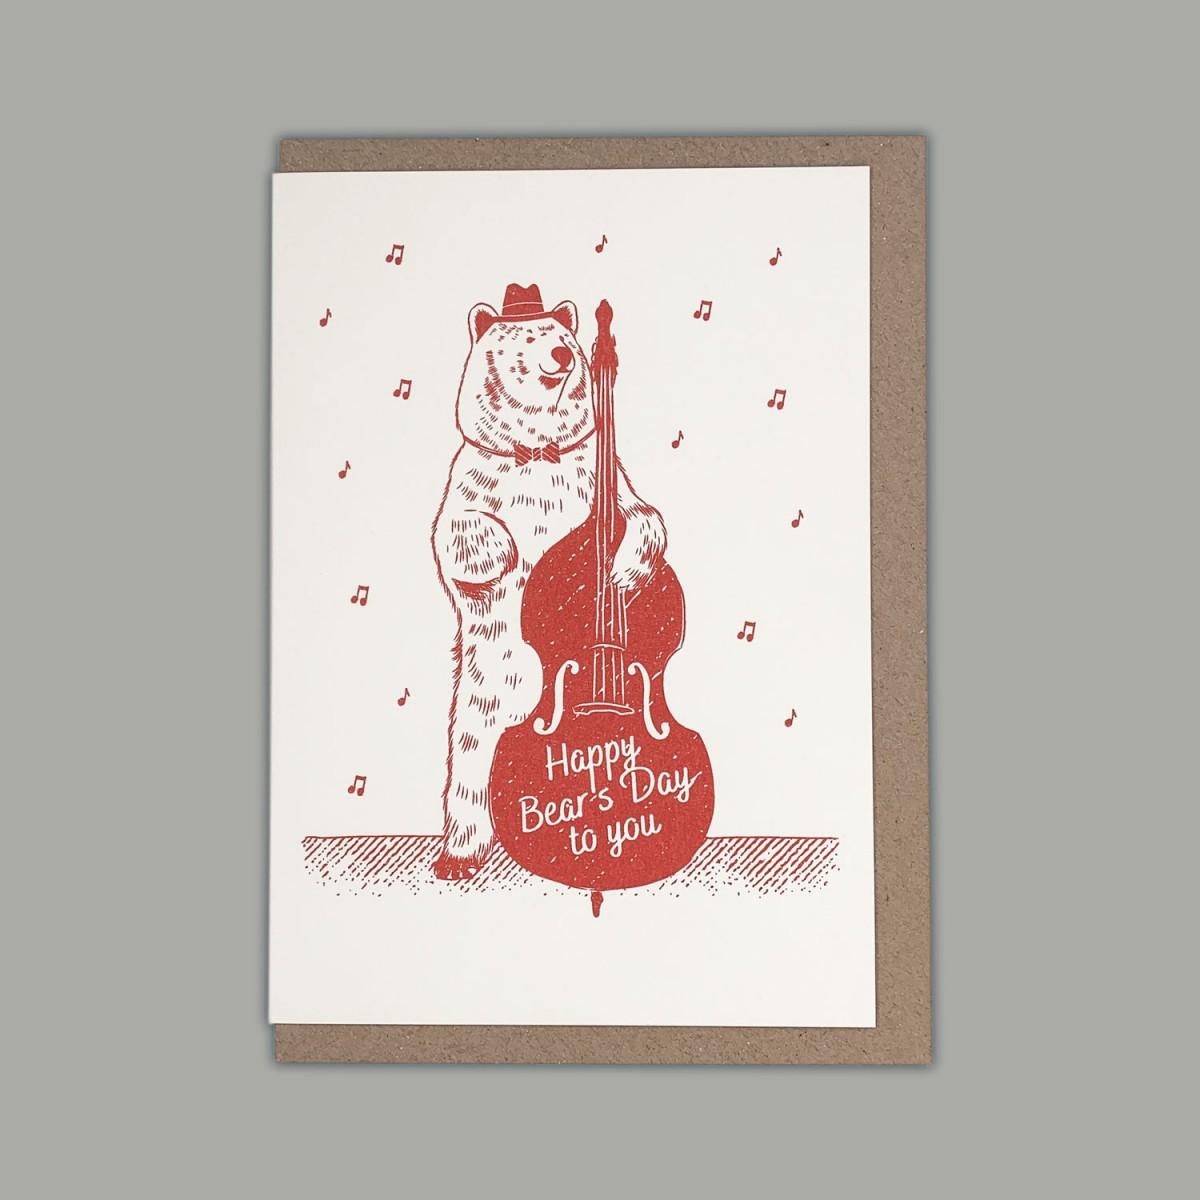 Feingeladen // LOVELY BEASTS // Bear »Happy Bear's Day to you« (CR) // RISO-Klappkarte, A6